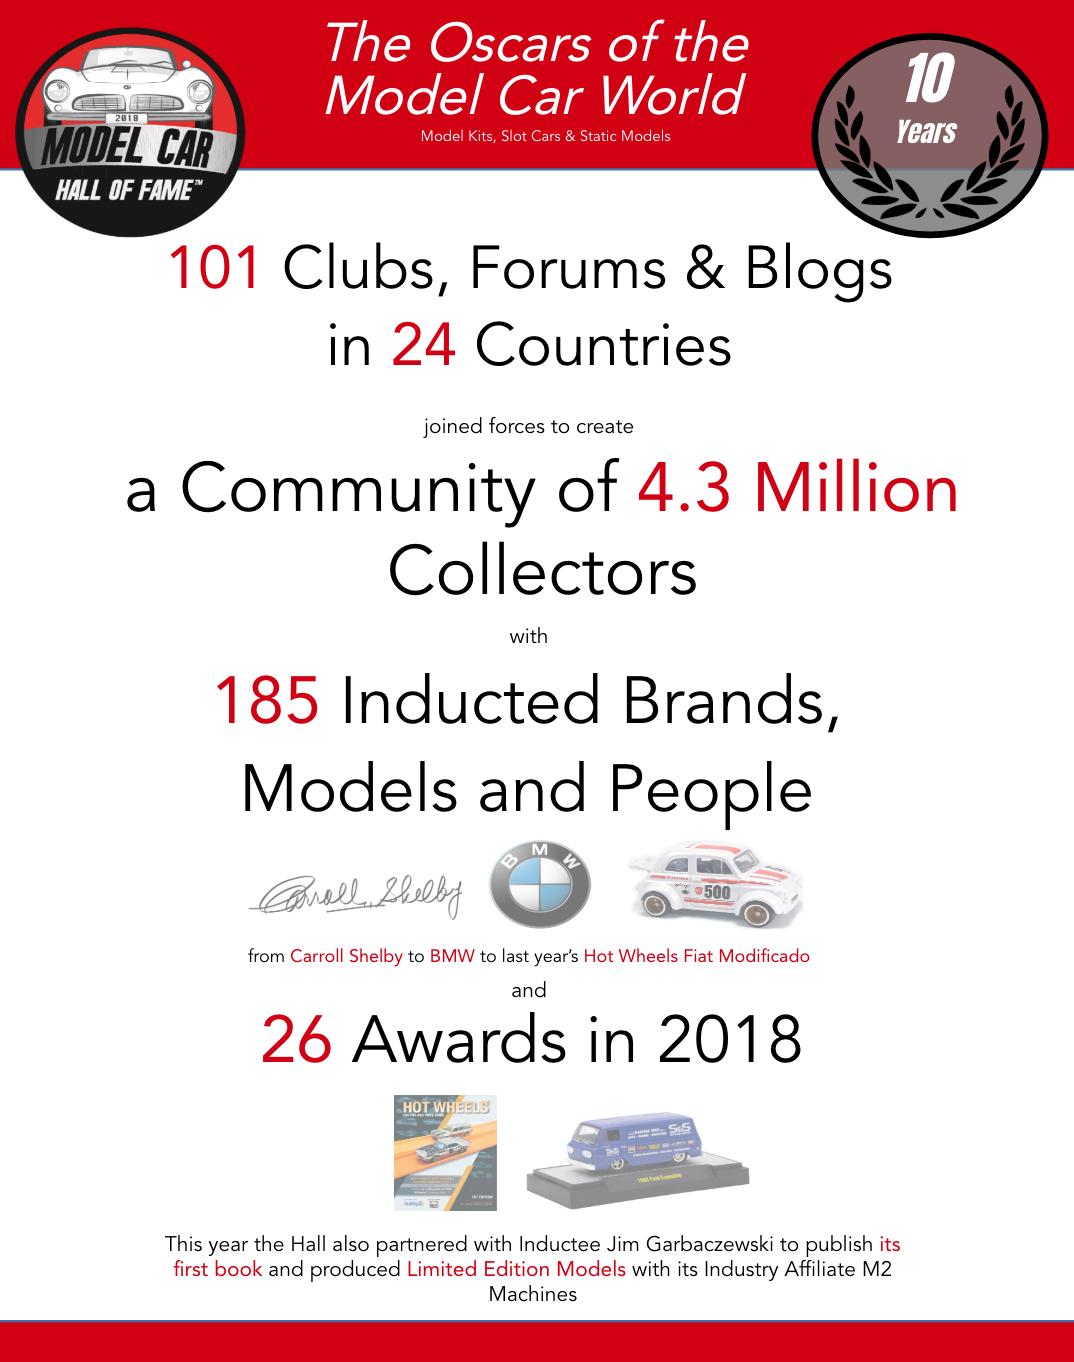 Model Car Hall infographic